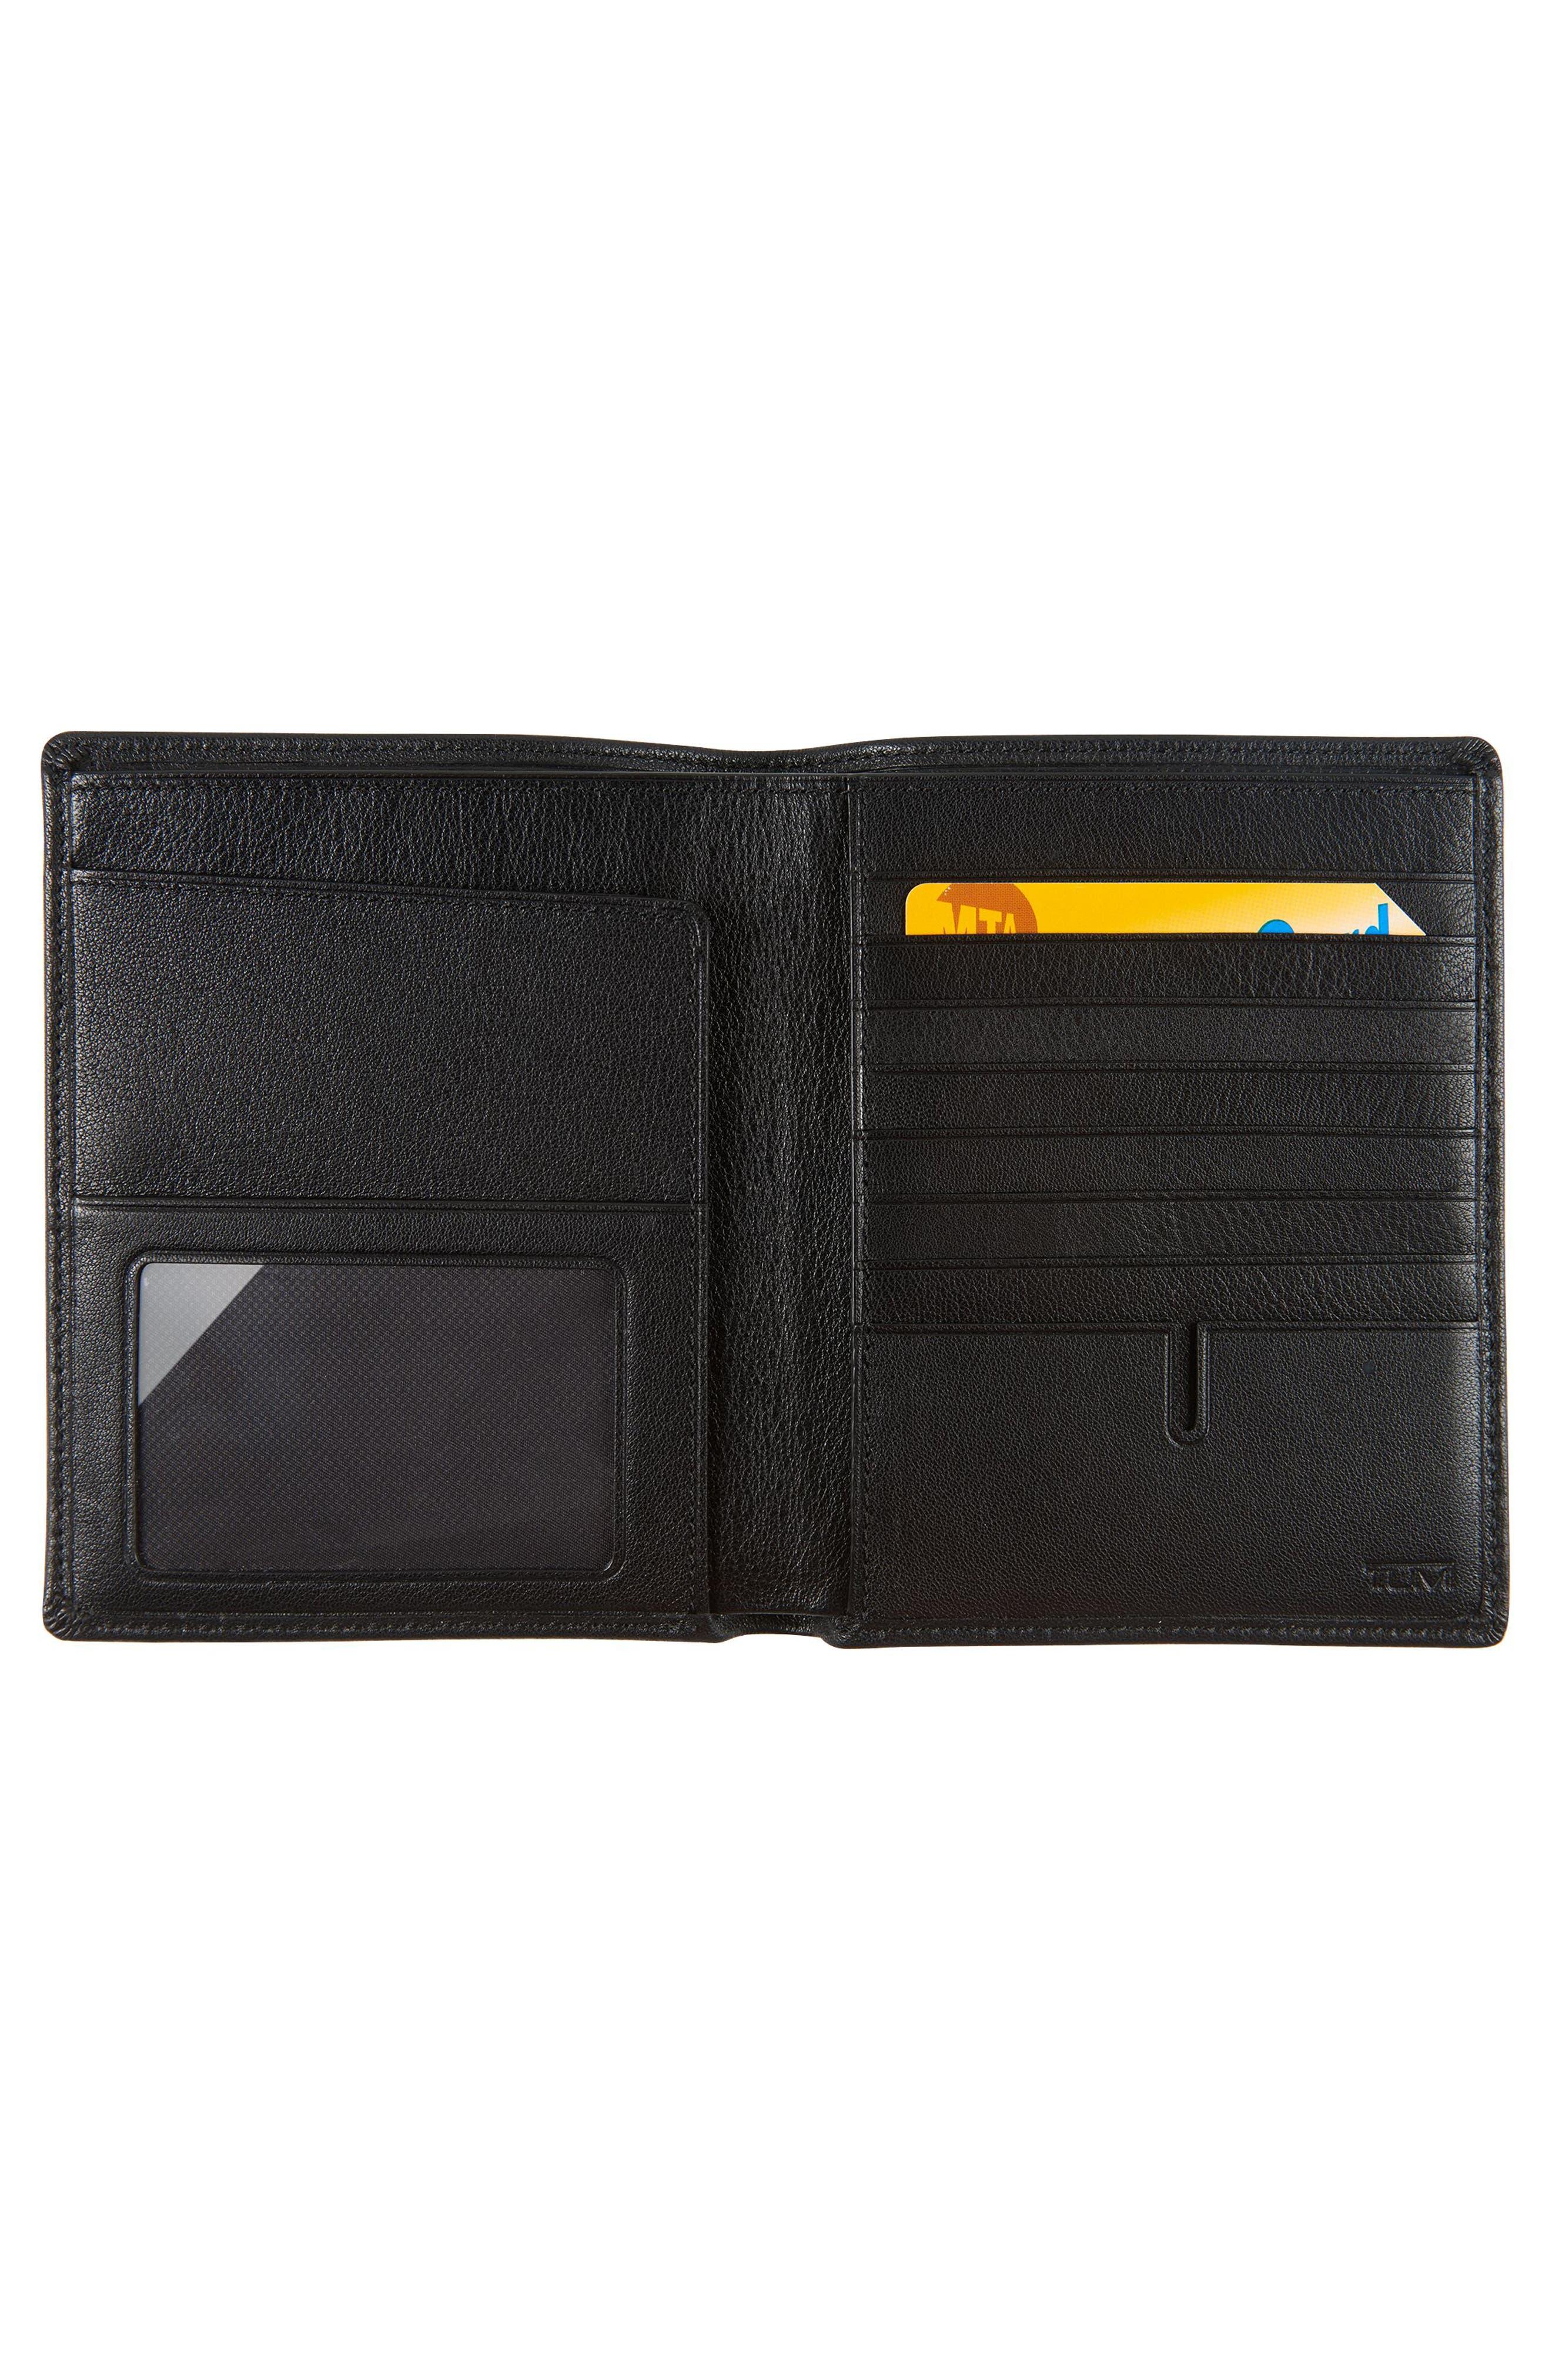 Leather Passport Case,                             Alternate thumbnail 2, color,                             Black Textured